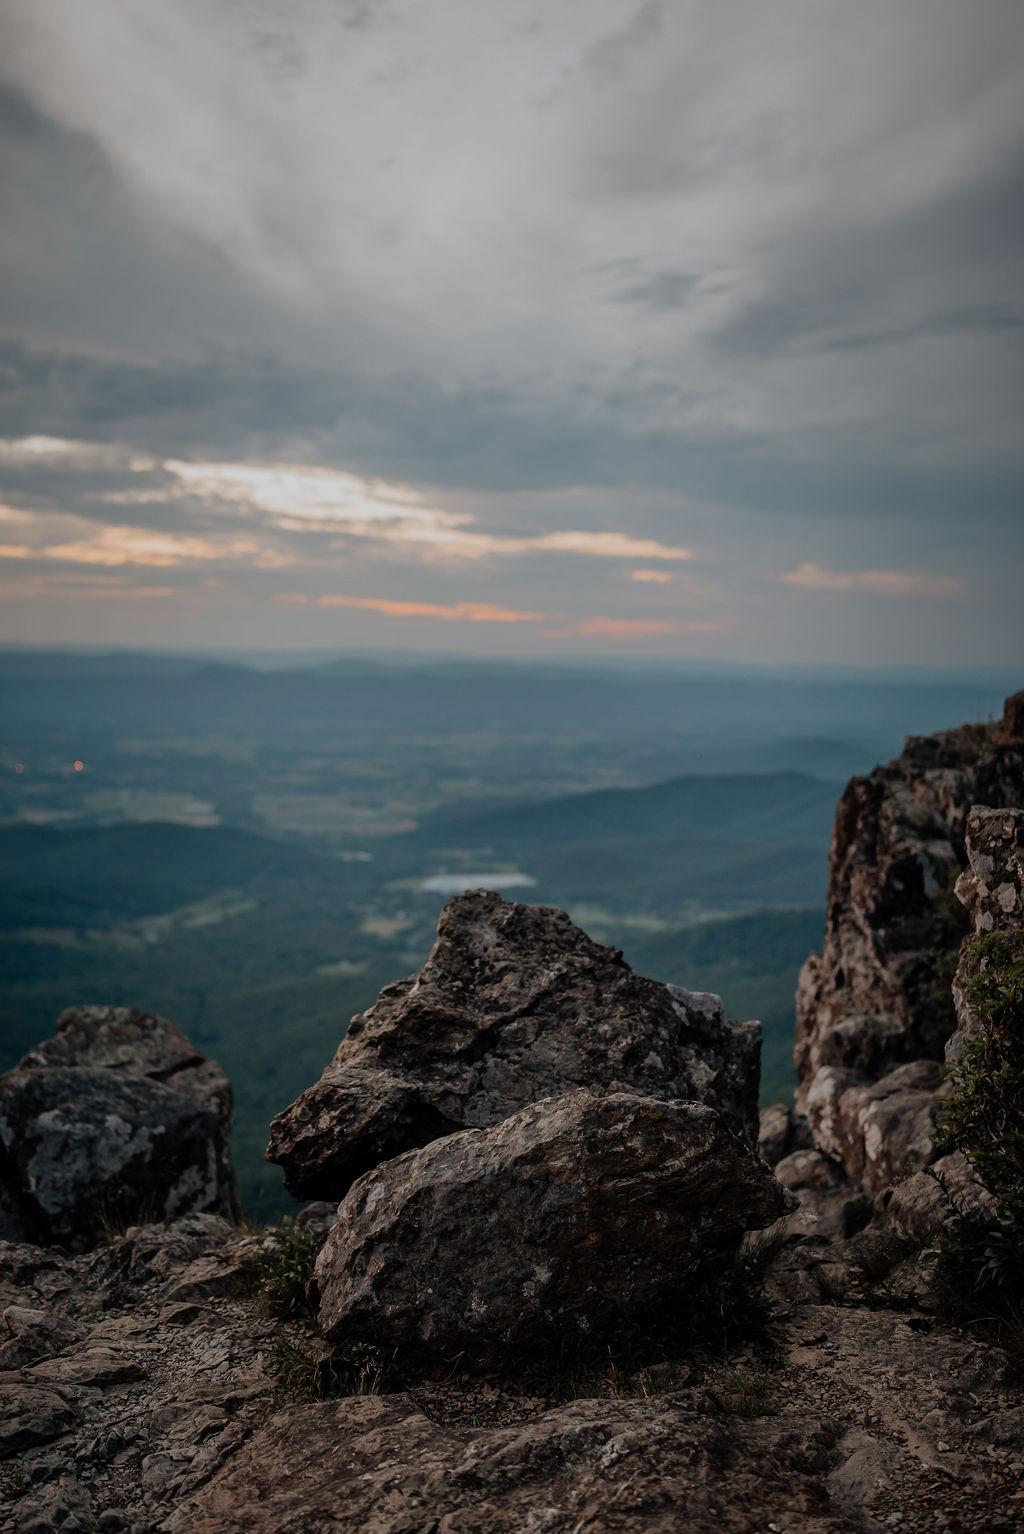 Jess-and-Amir_Shenandoah-AdventureSession-Flit-Photography-181-min